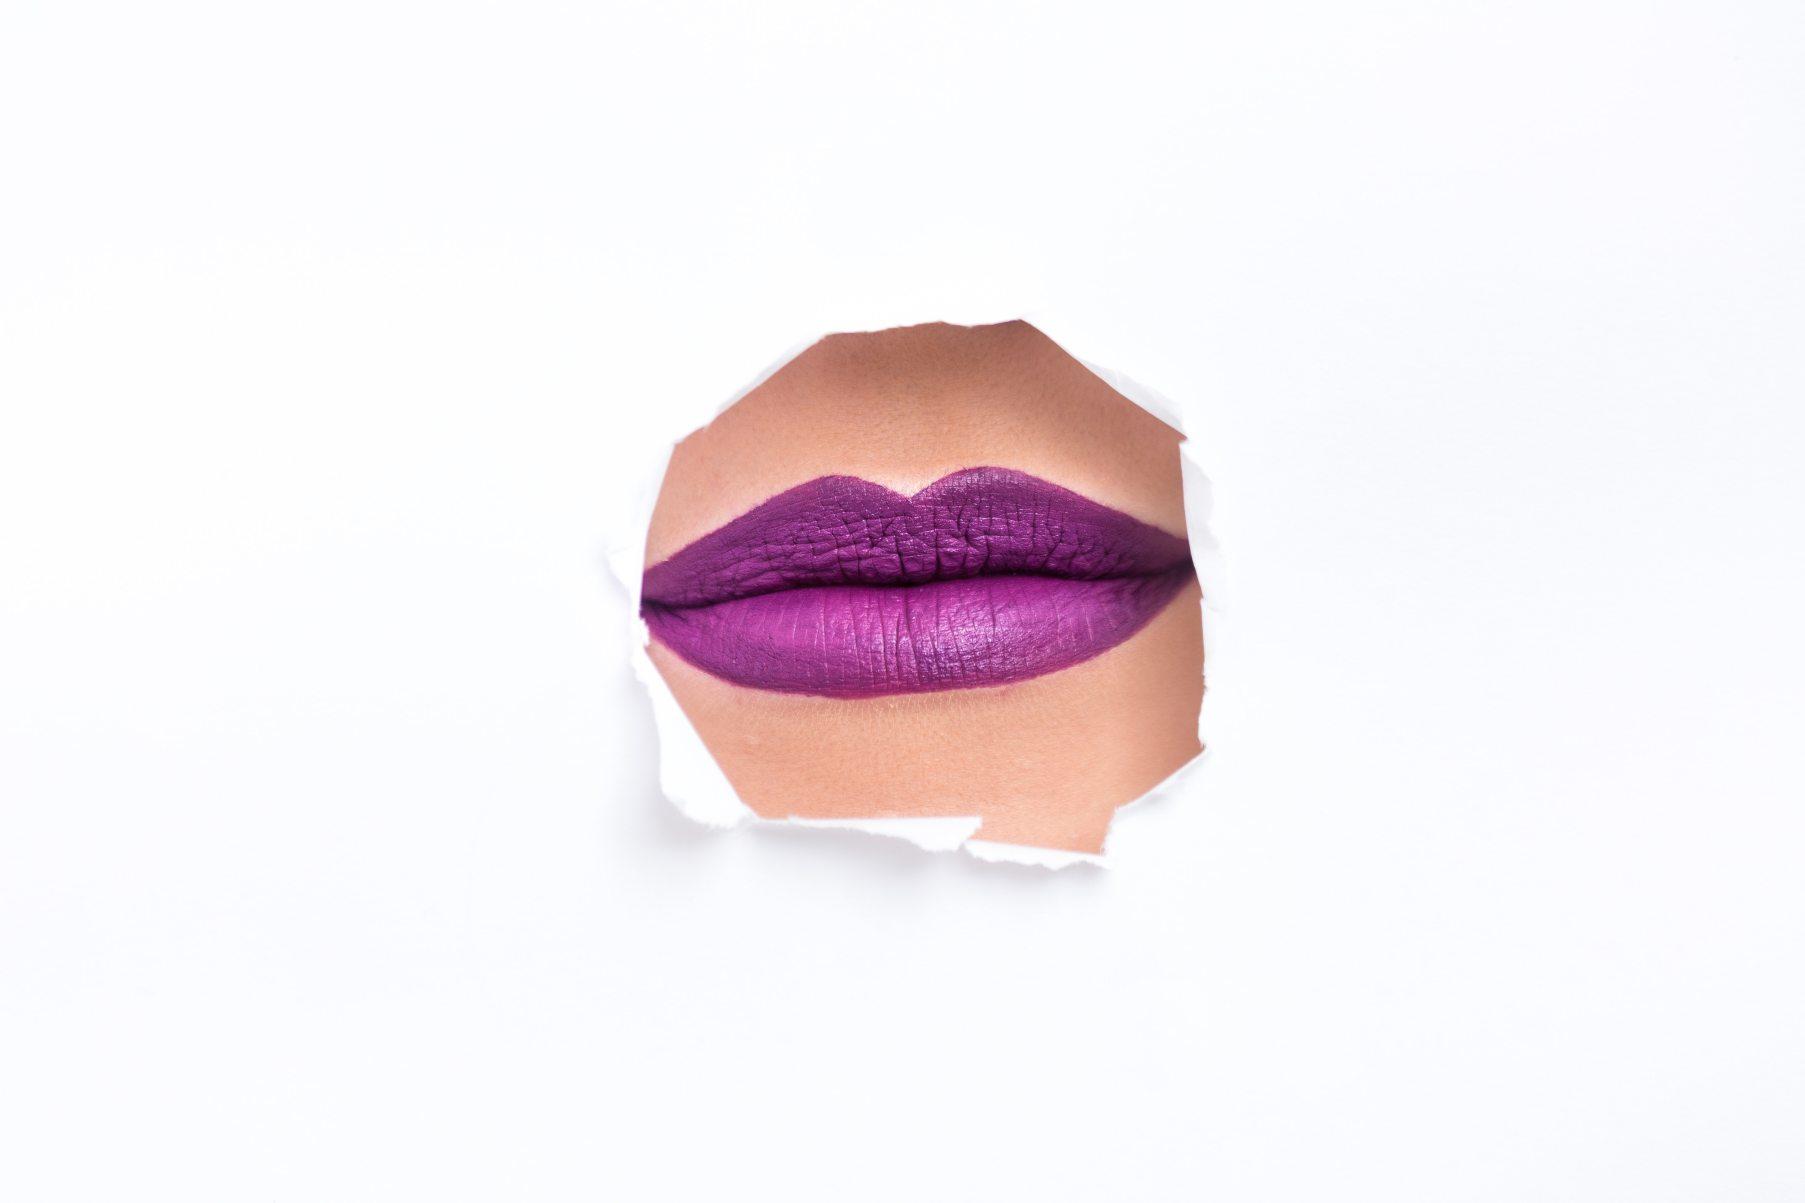 Lips with purple lipstick